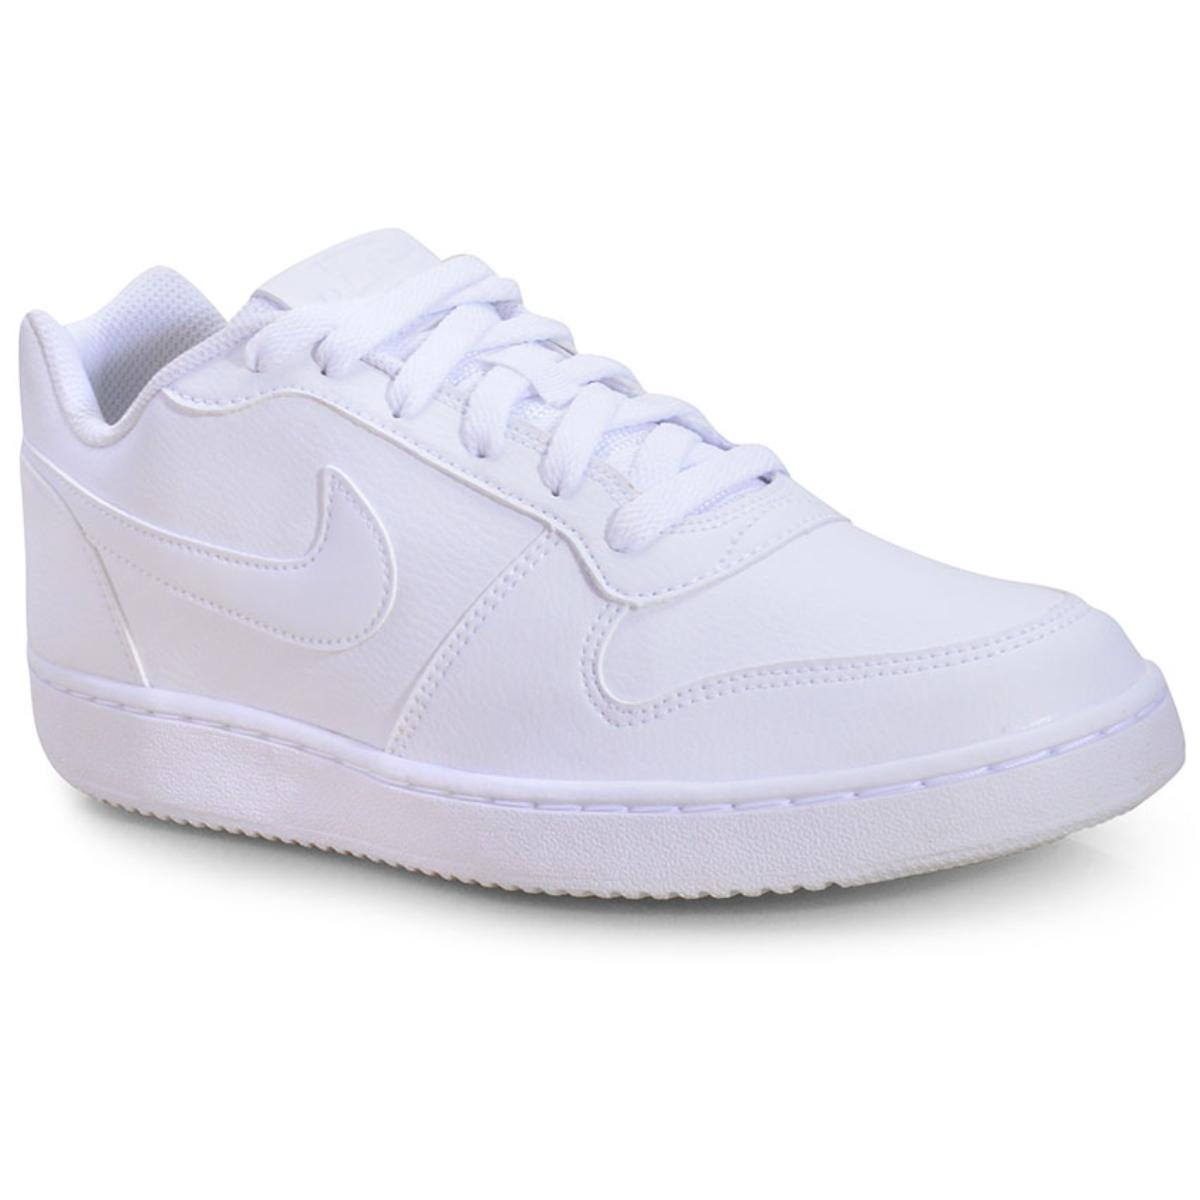 Tênis Masculino Nike Aq1775-100 Ebernon Low Branco